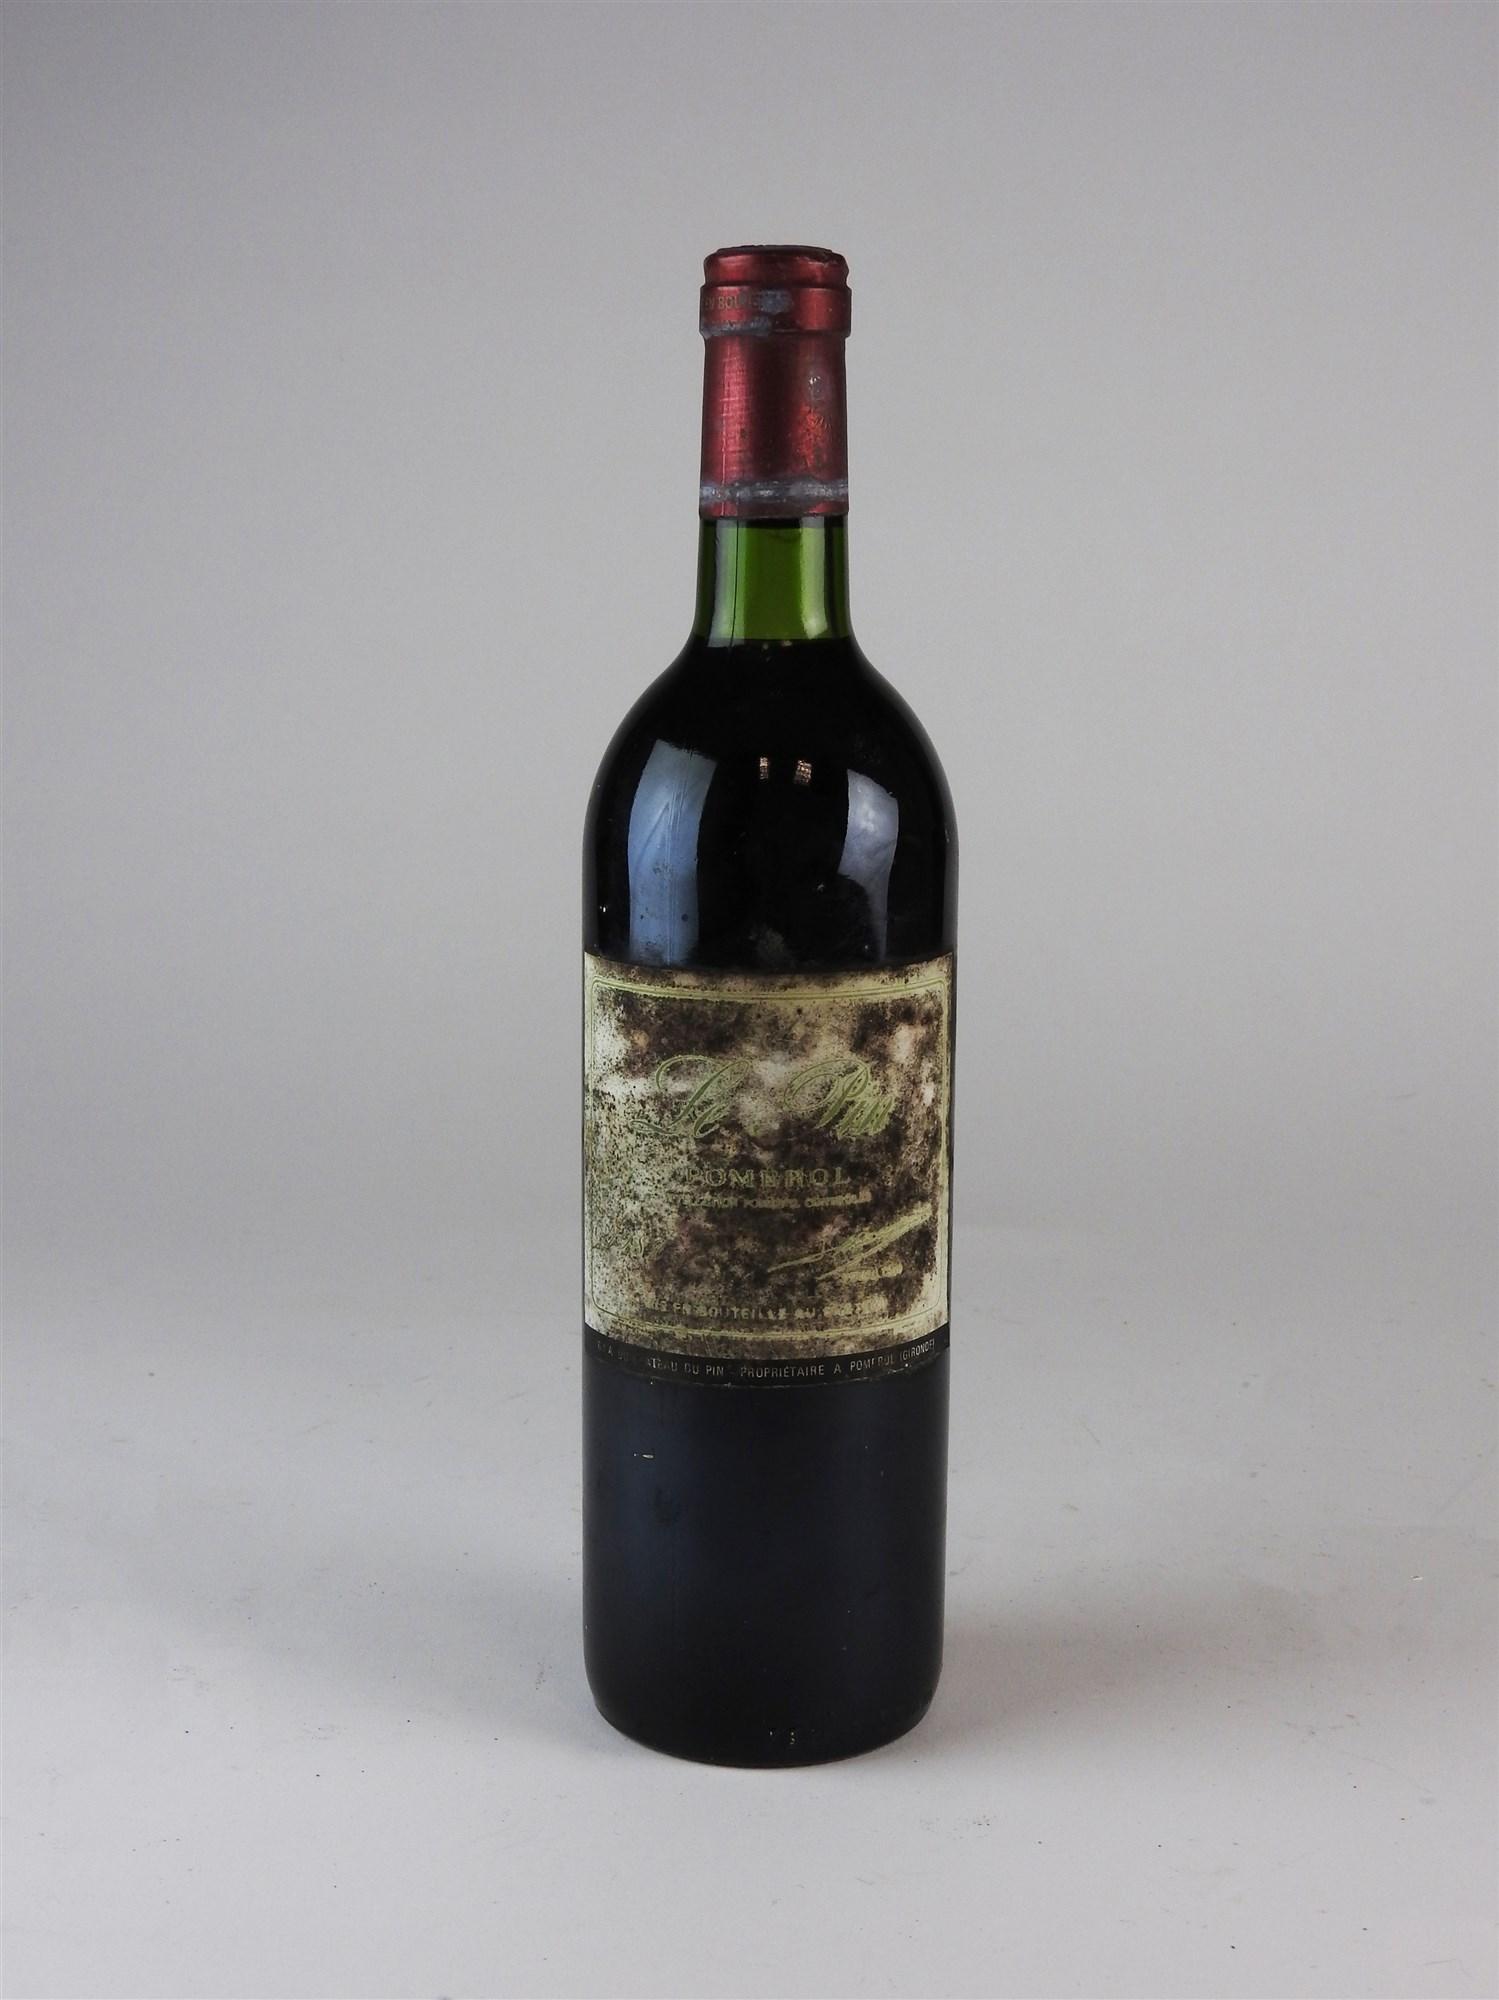 A Pomerol Le Pin red wine